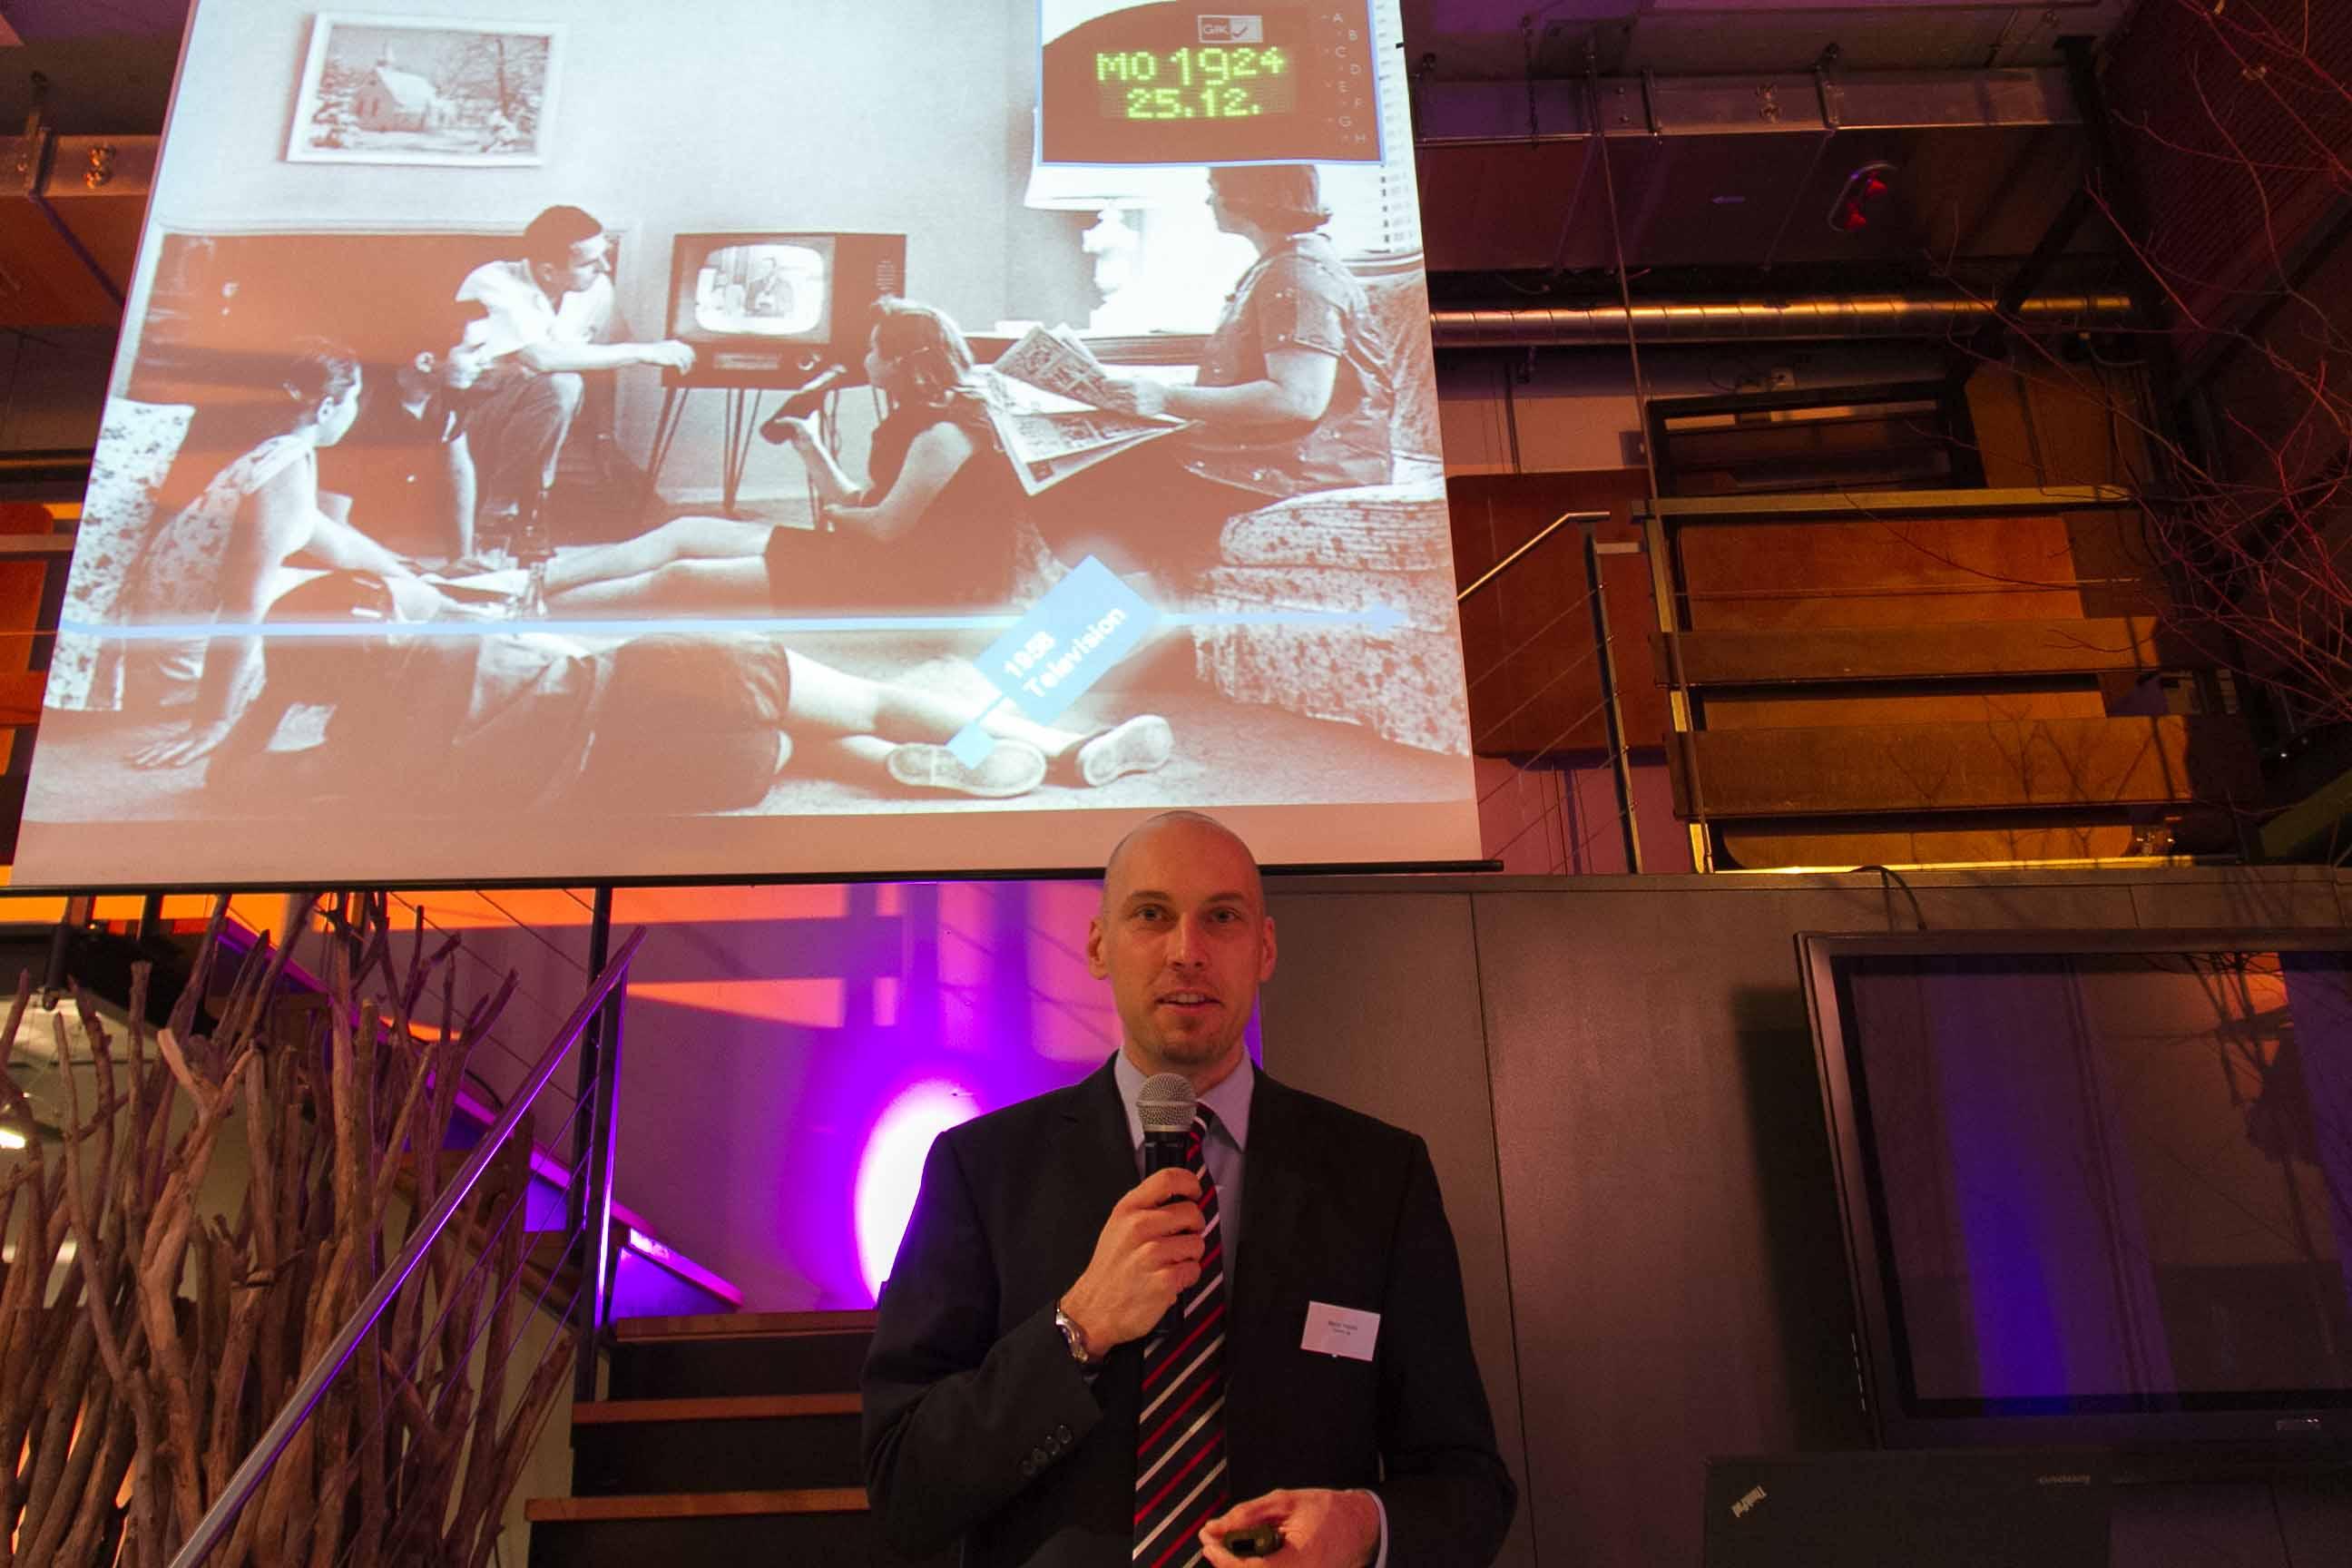 Kommunikation-Fernseher-Marco-Hassler-Namics-Vortrag-SIMSA-Late-Afternoon-Talk